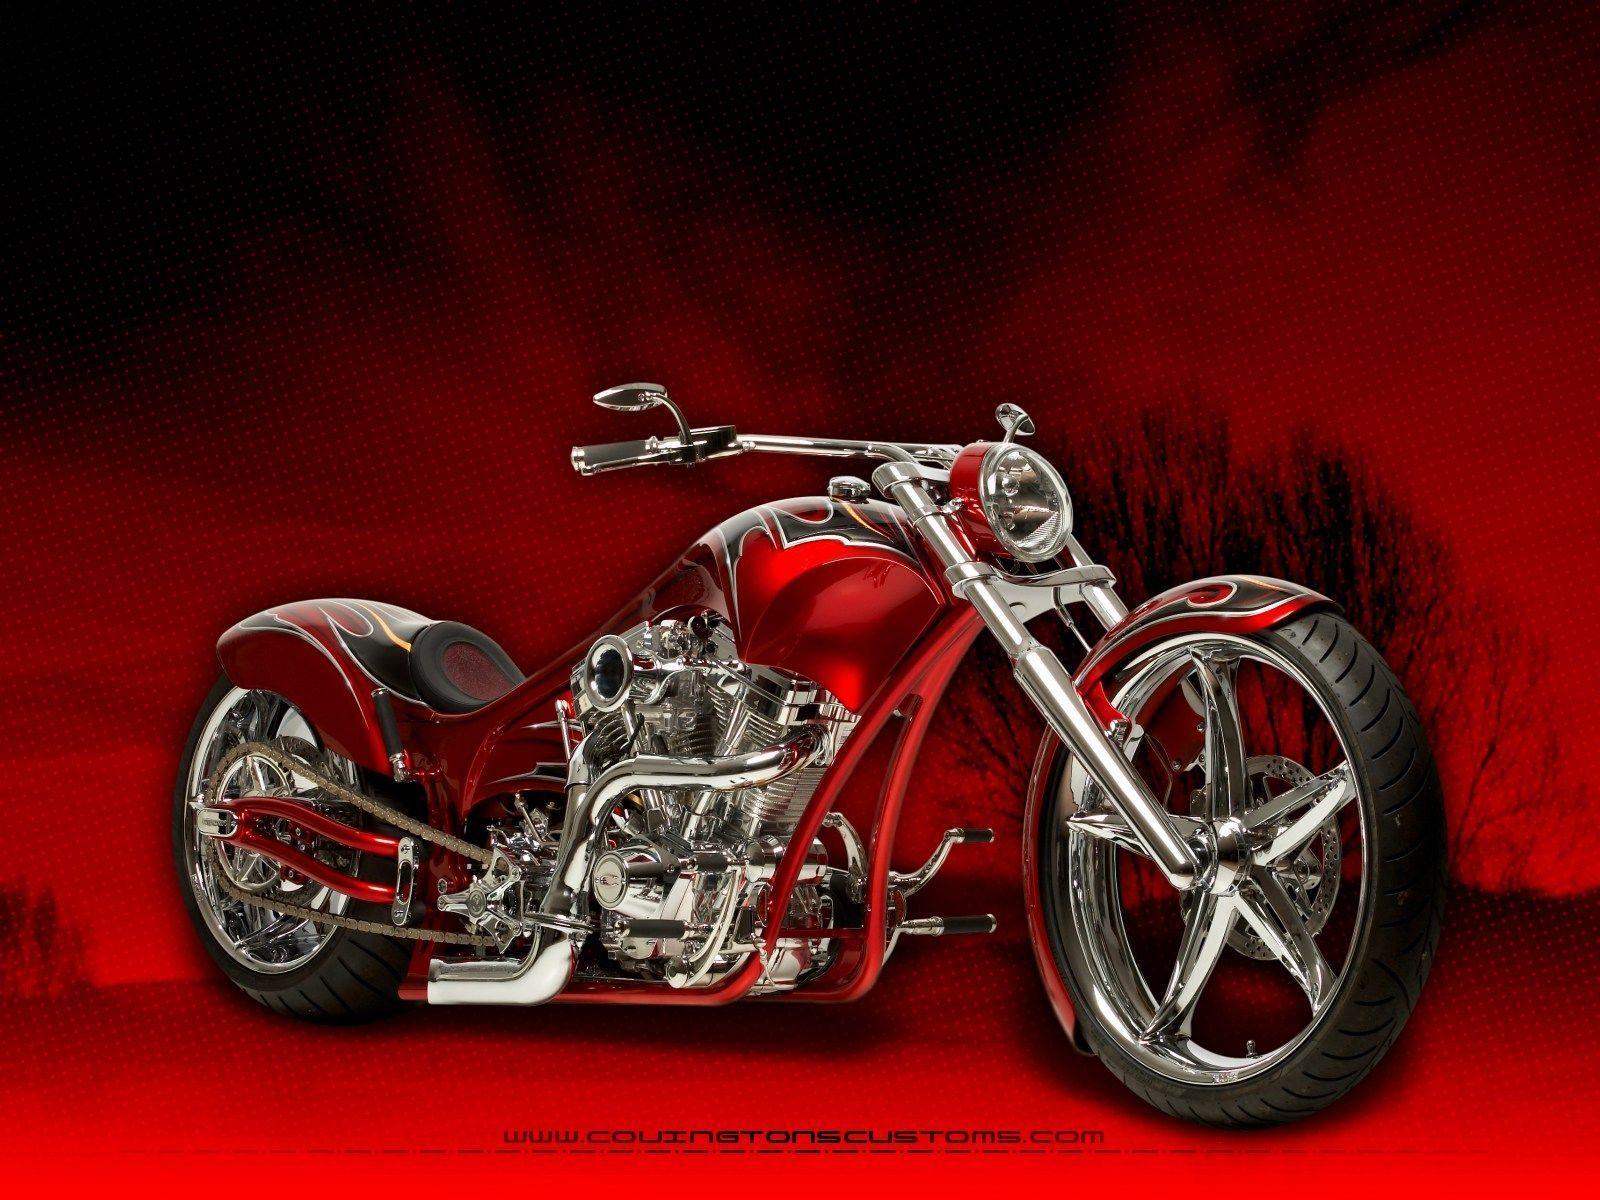 Vintage Motorcycle Wallpaper Wide Free Download Rat Bike